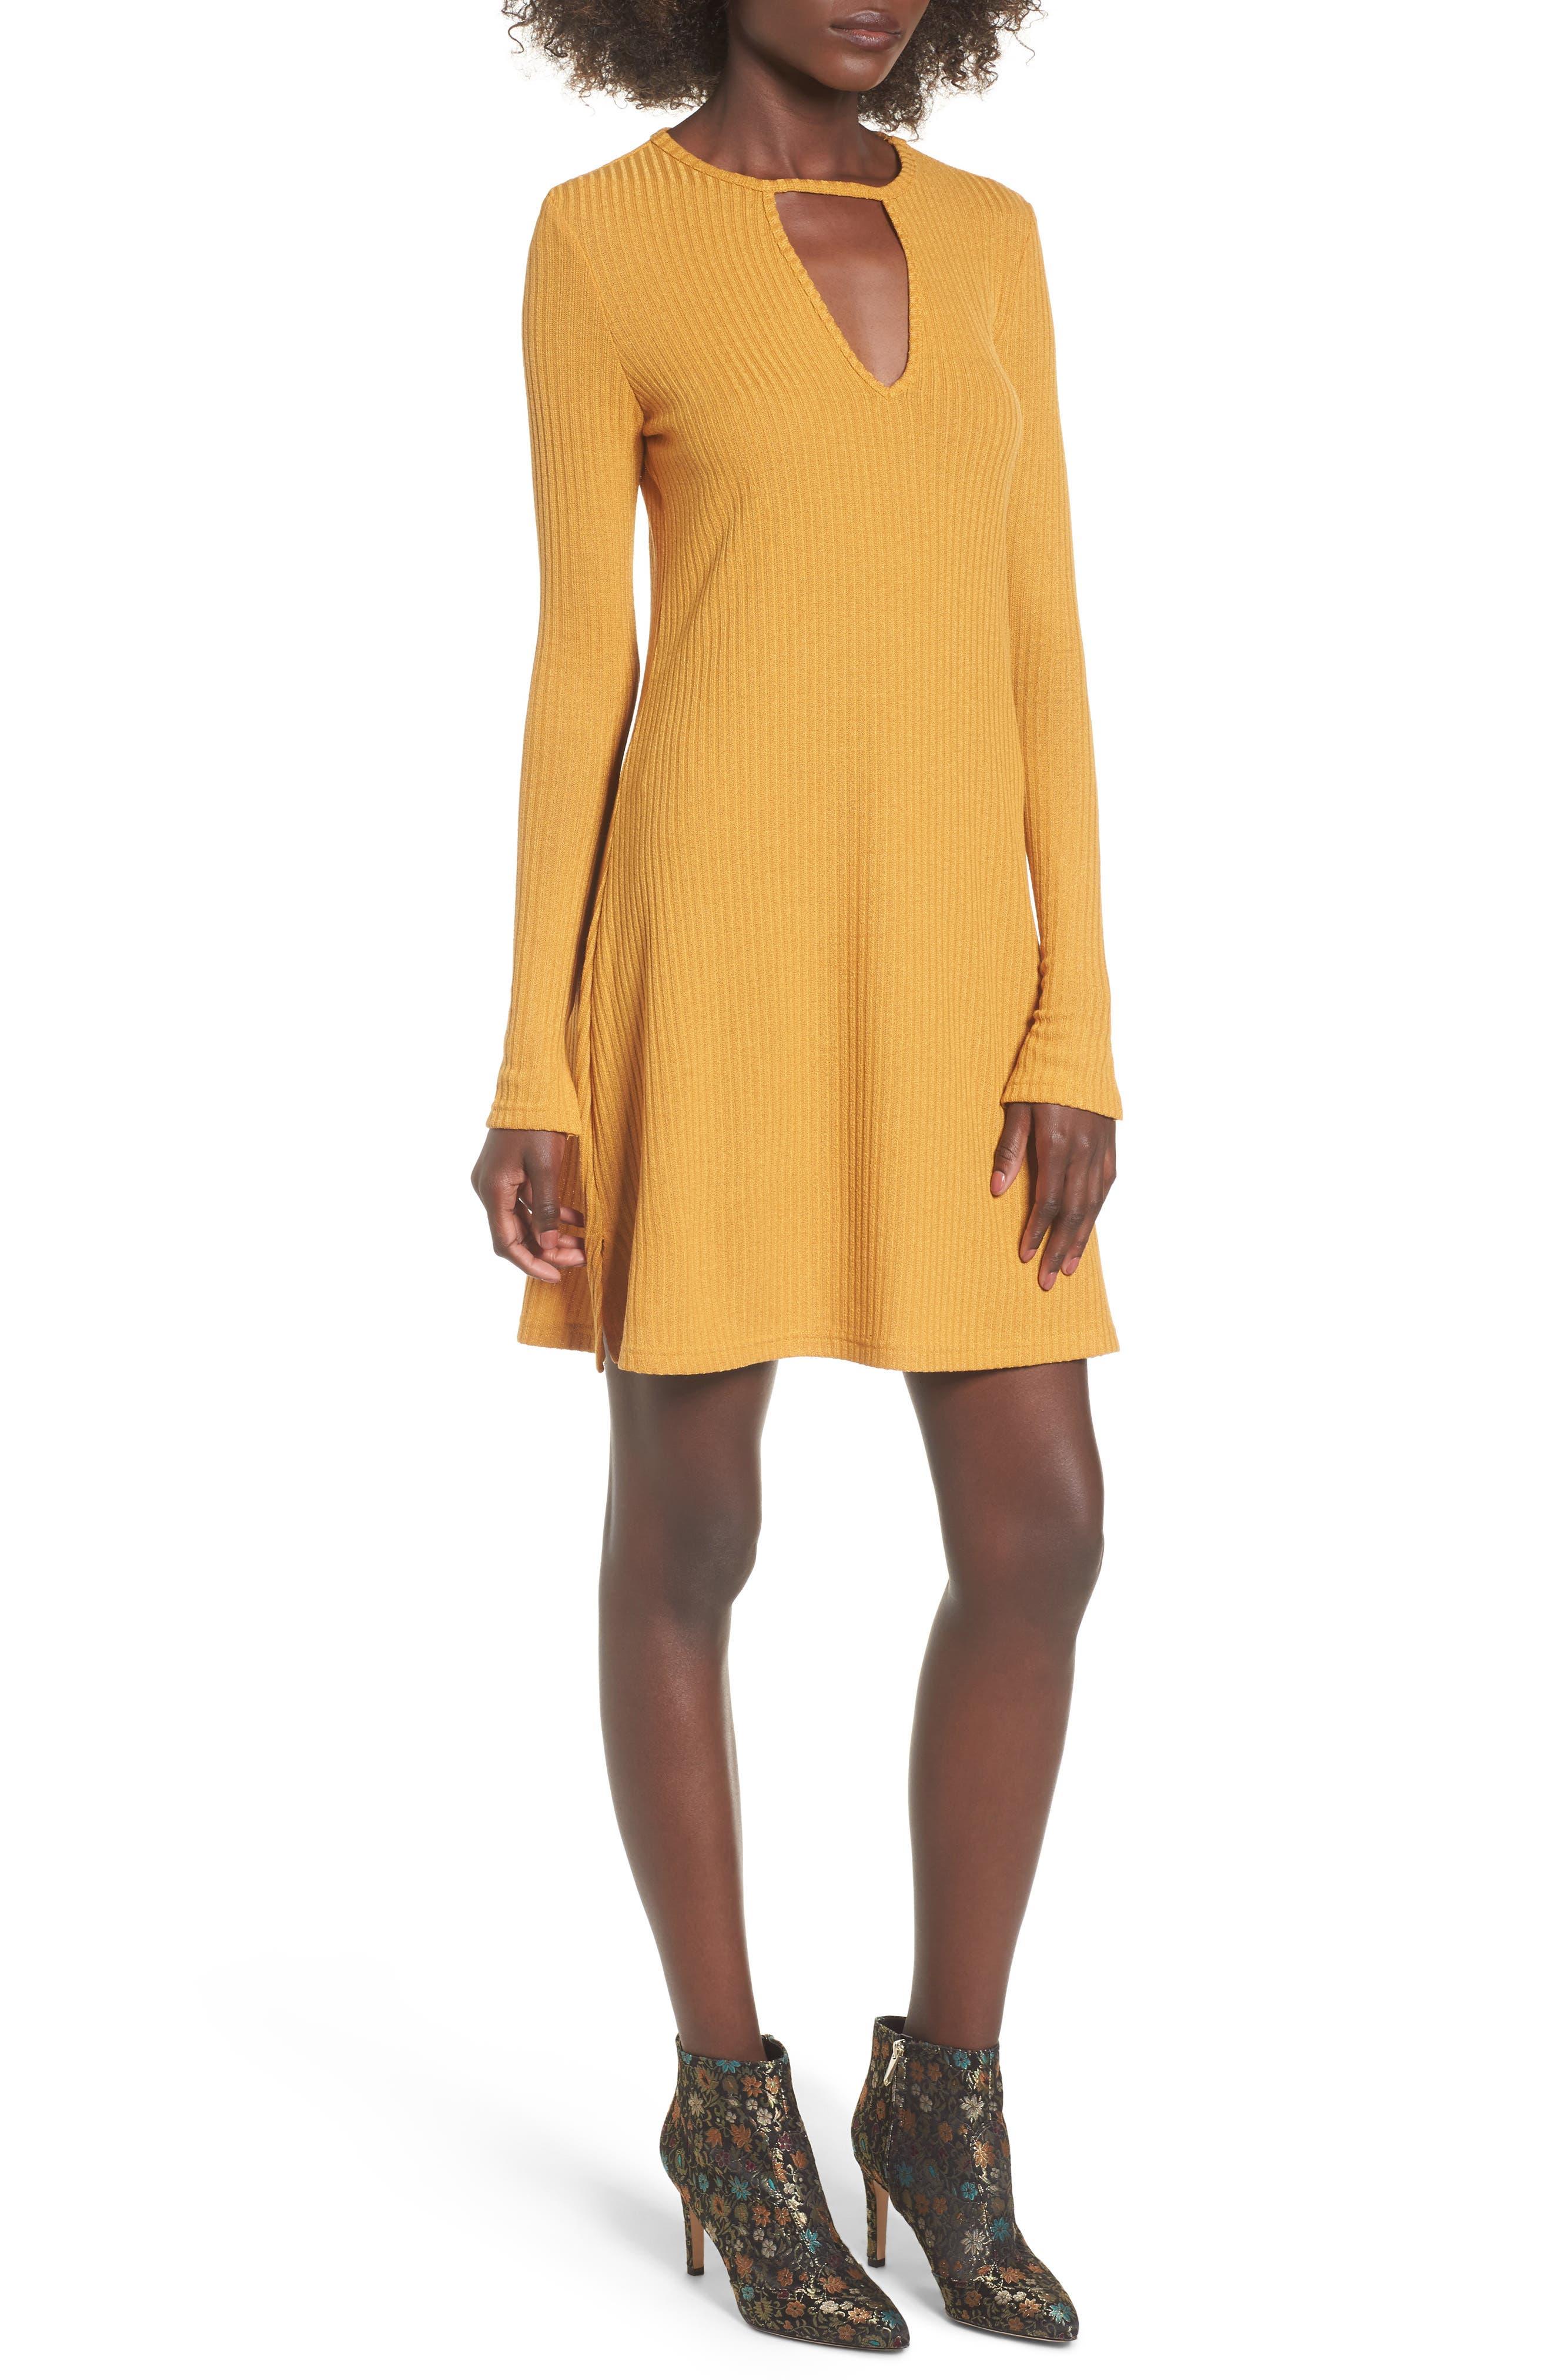 Maven Thermal Dress,                         Main,                         color, Mustard